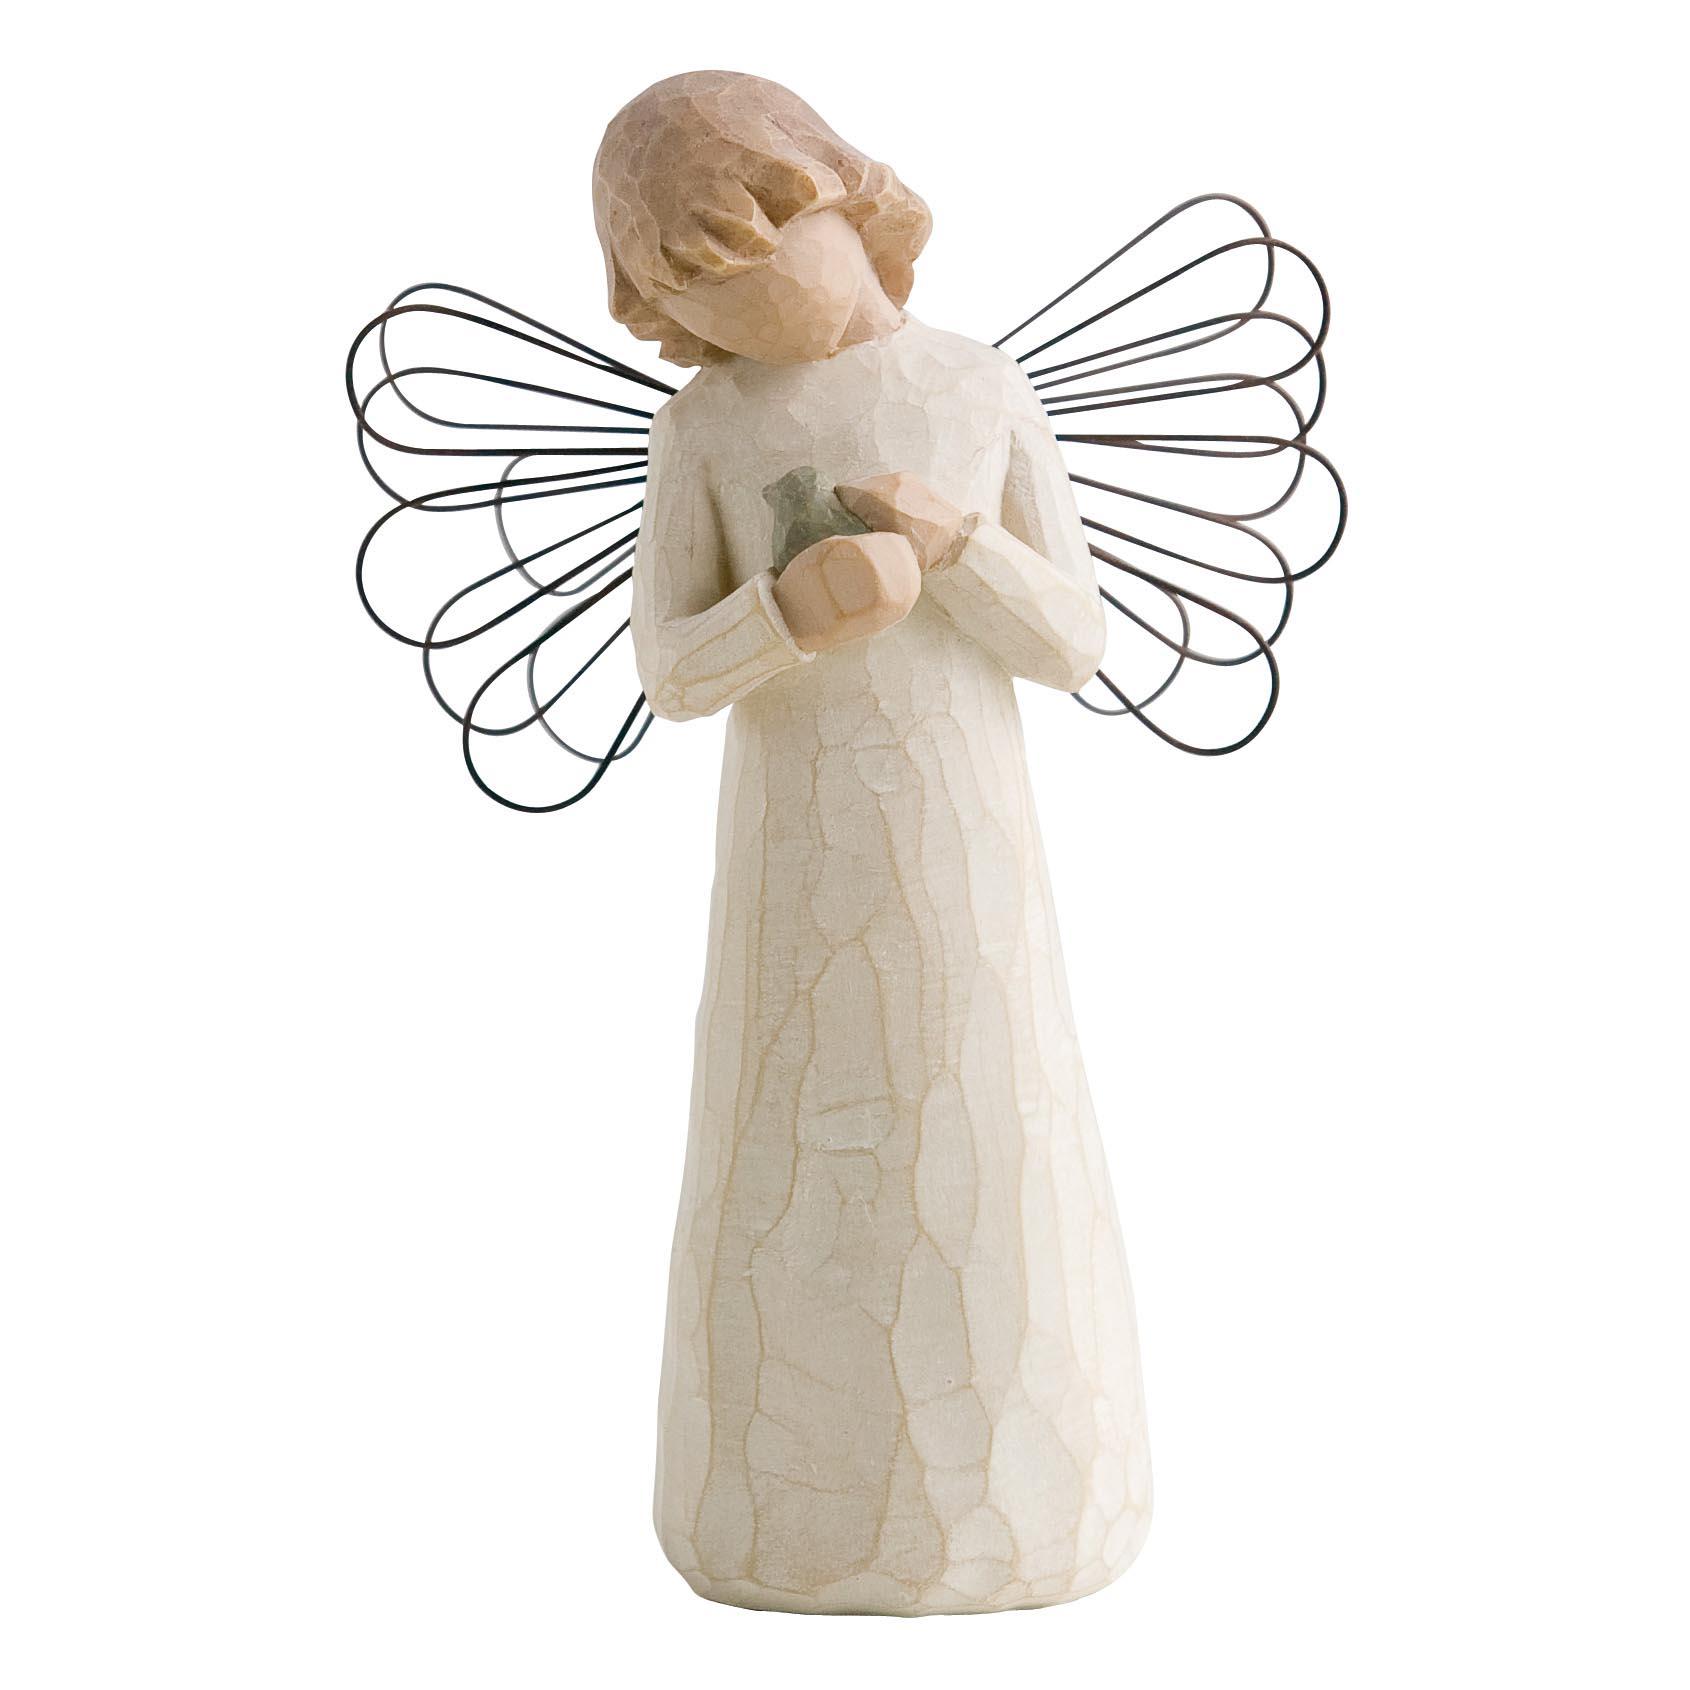 Angel of healing / Heilung (26020)